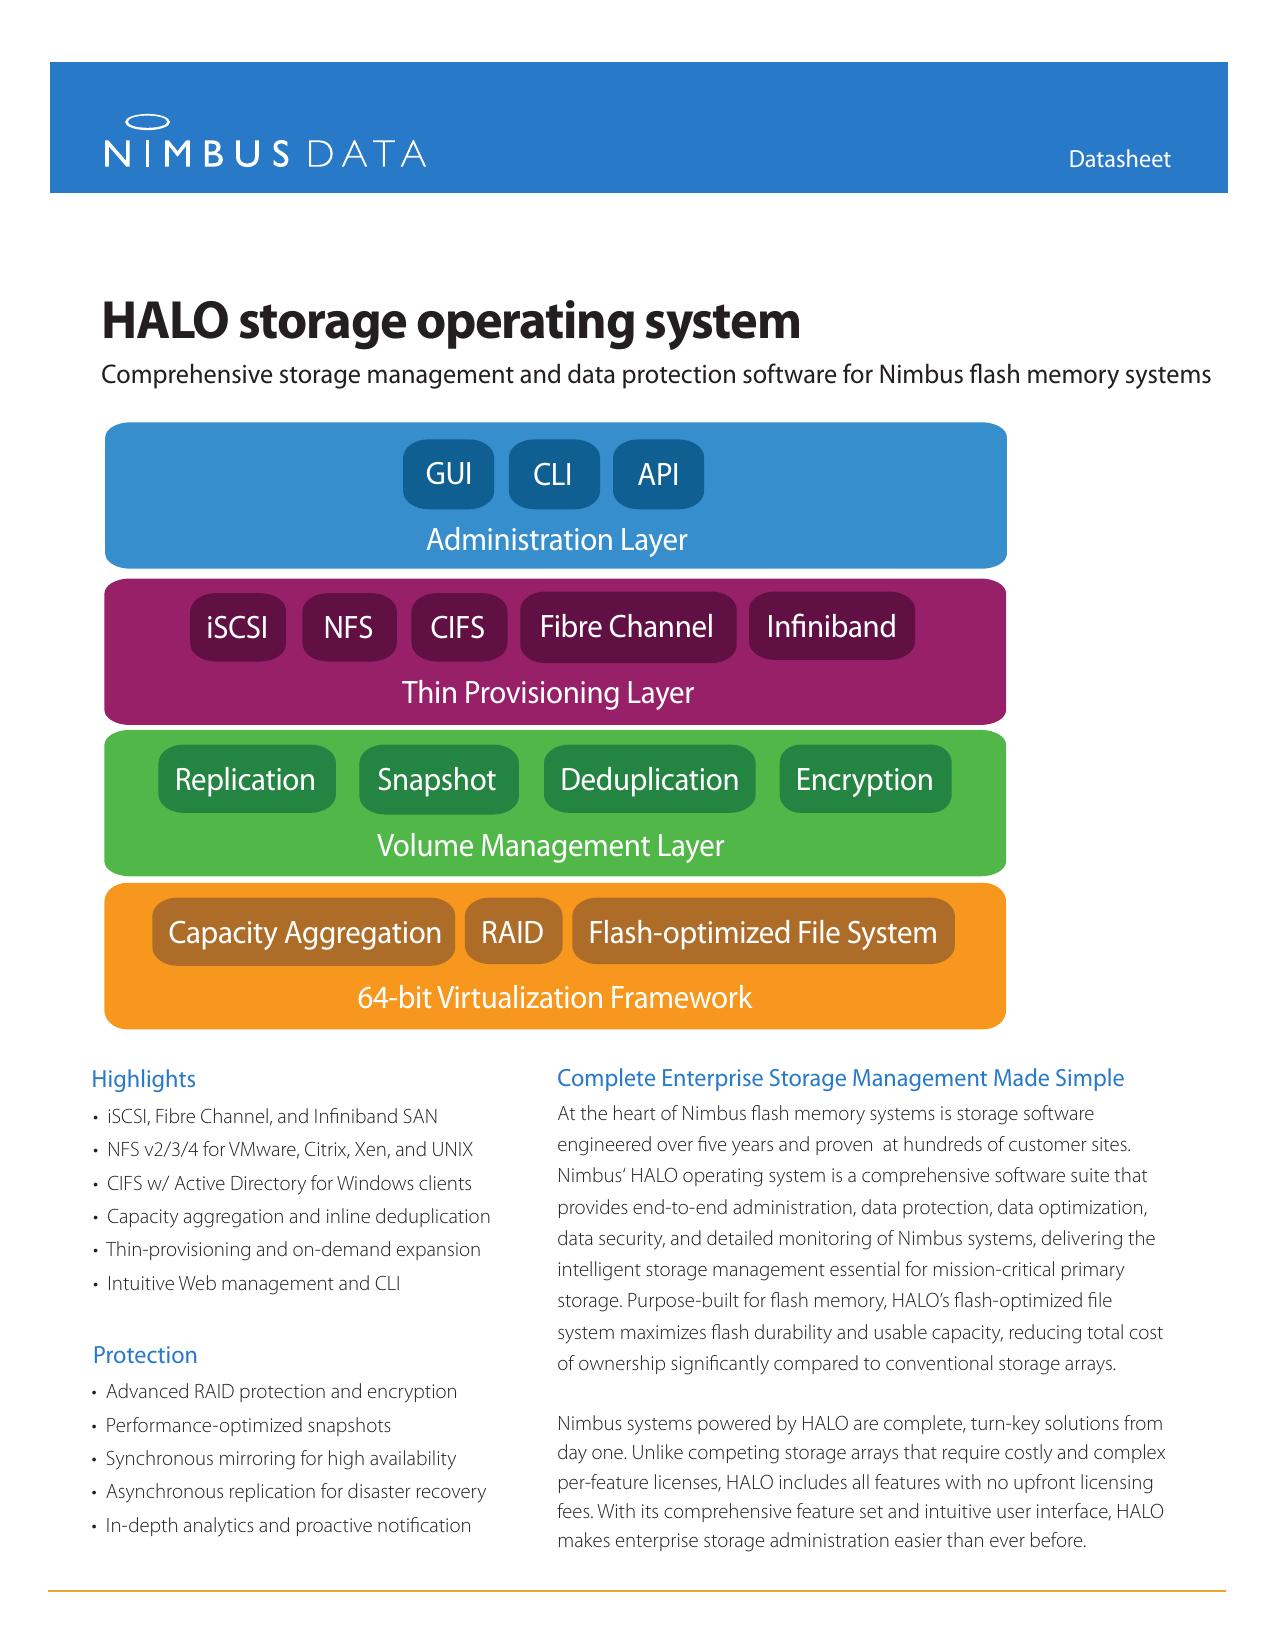 magasin en ligne c7e90 731b7 Nimbus Data HALO Operating System Data Sheet | manualzz.com